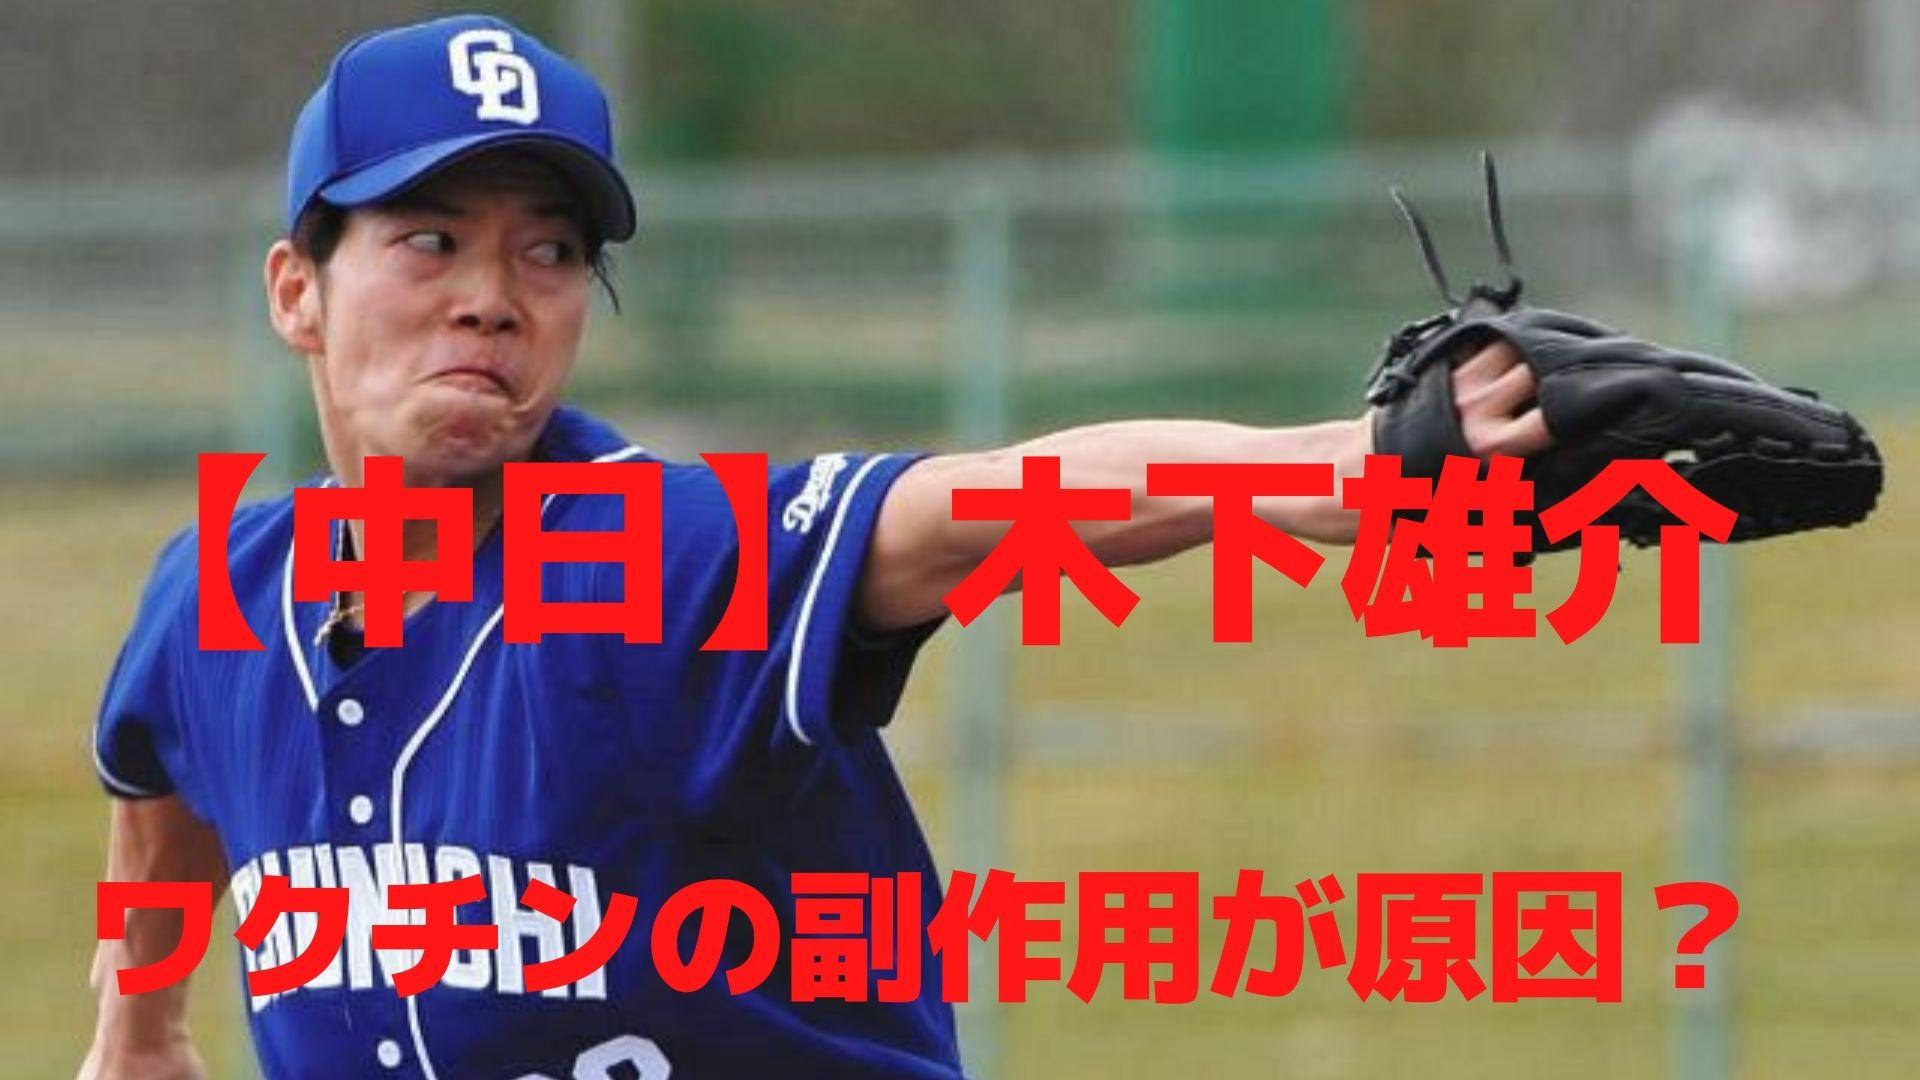 kinoshita-yusuke-daughter-in-law-child